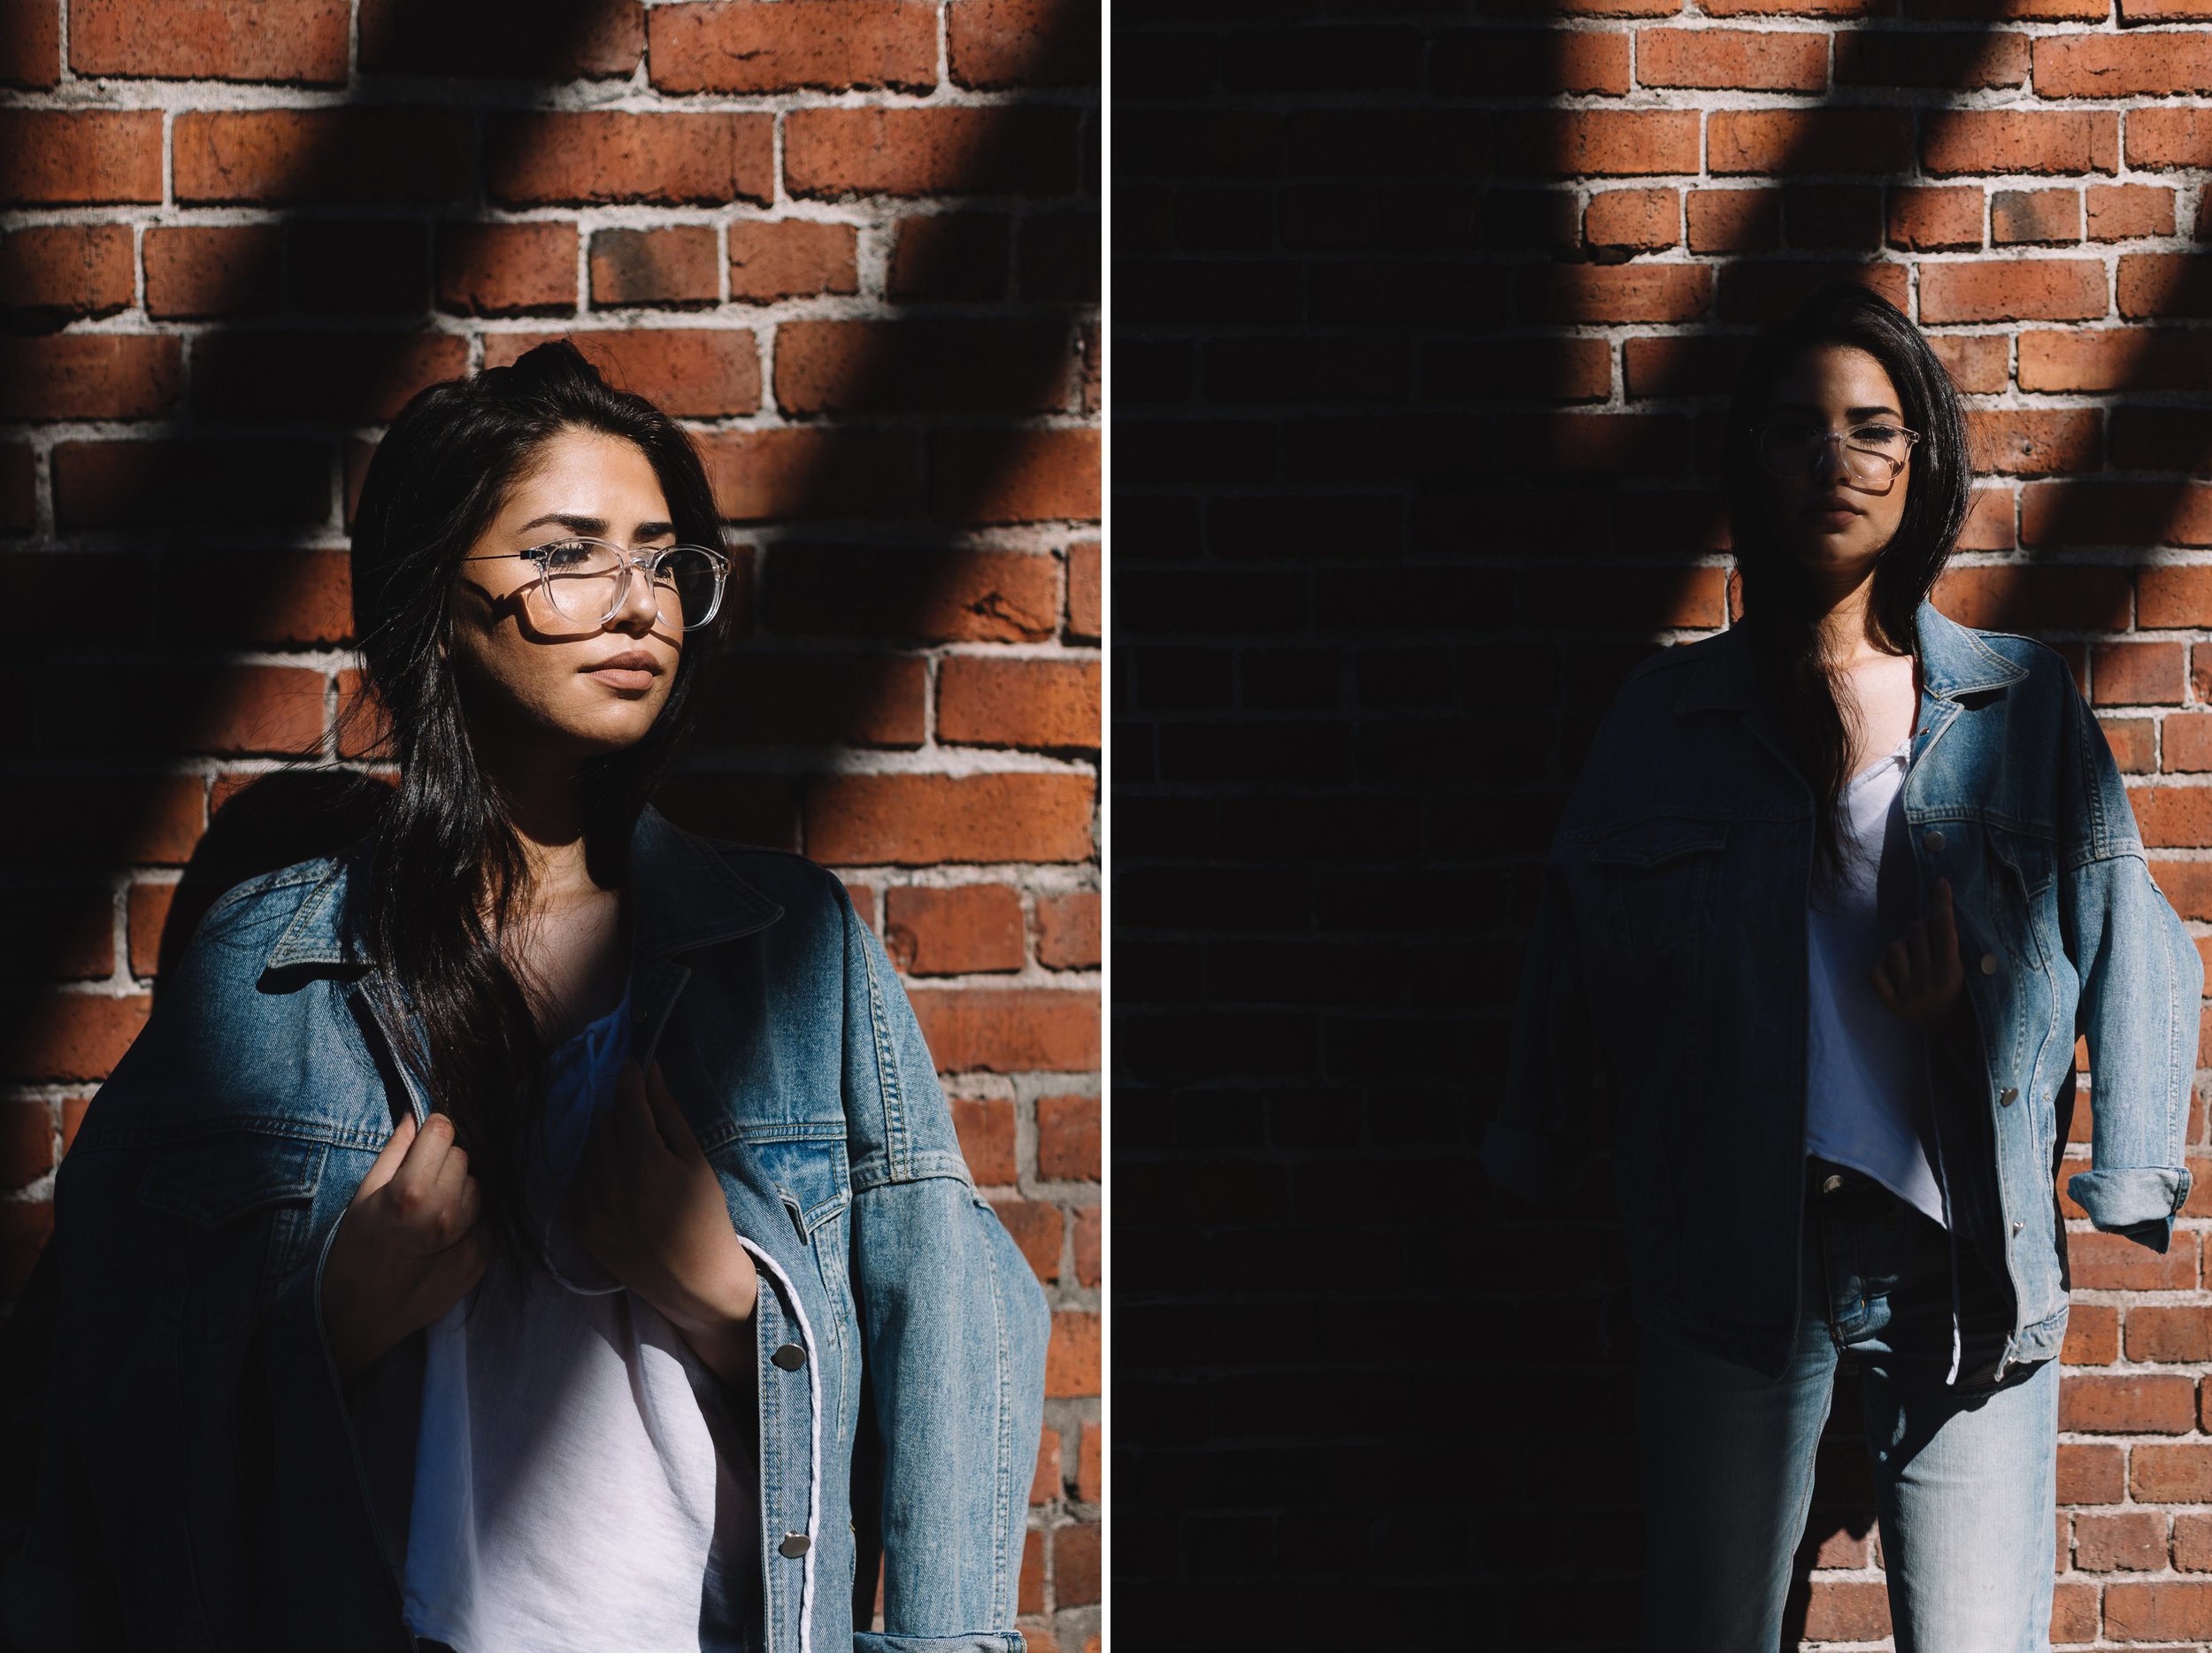 oliver-rabanes-photography-vancouver-surrey-portraits-08.jpg